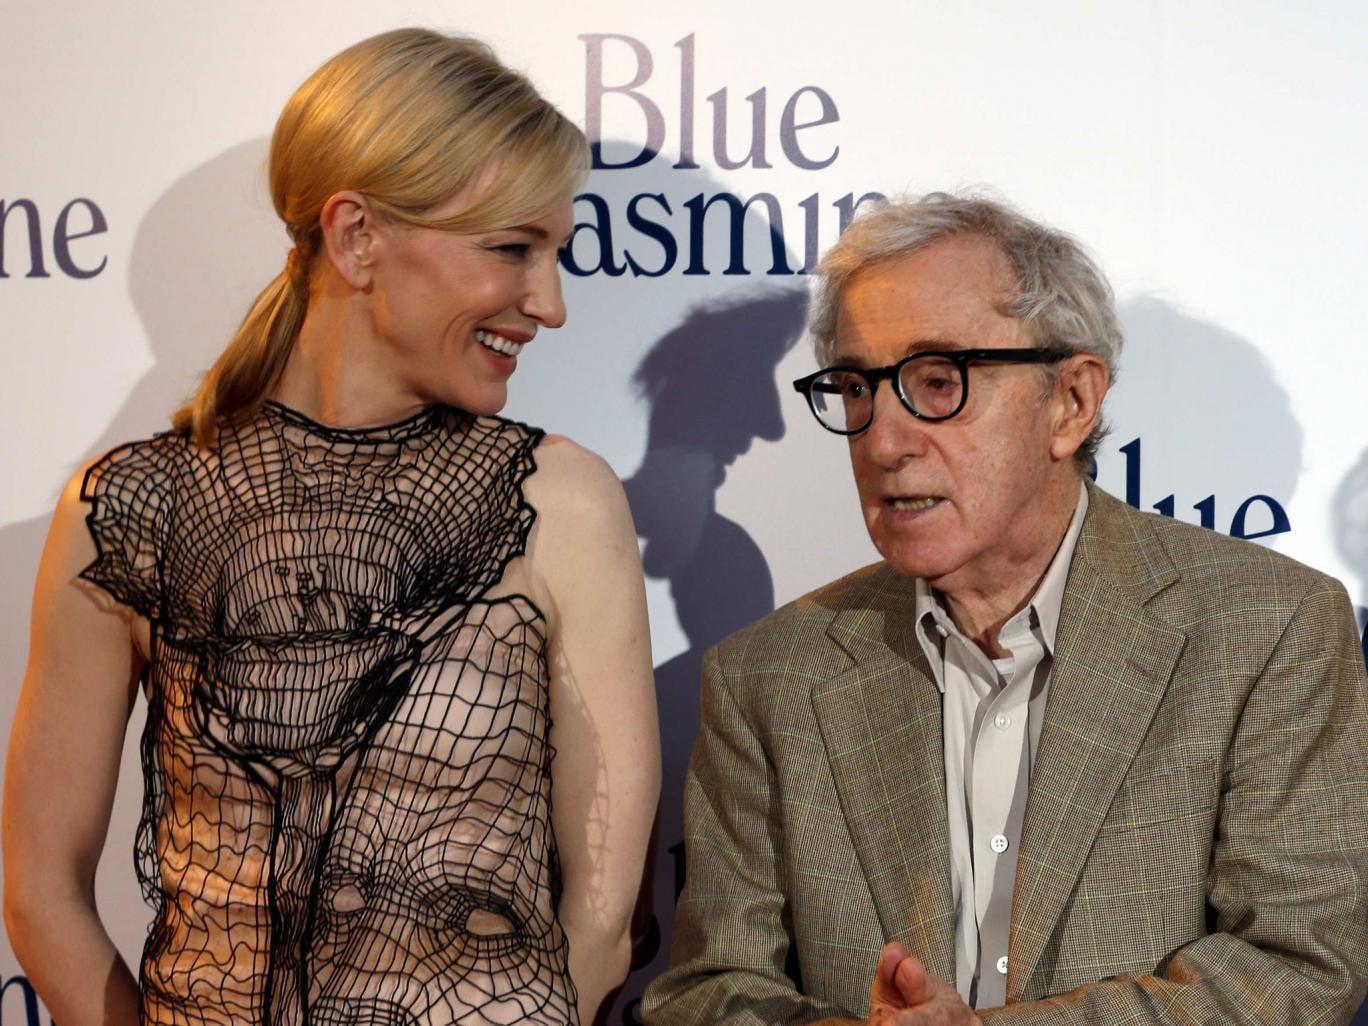 Woody Allen's new film Blue Jasmine premiered in Paris on Tuesday night